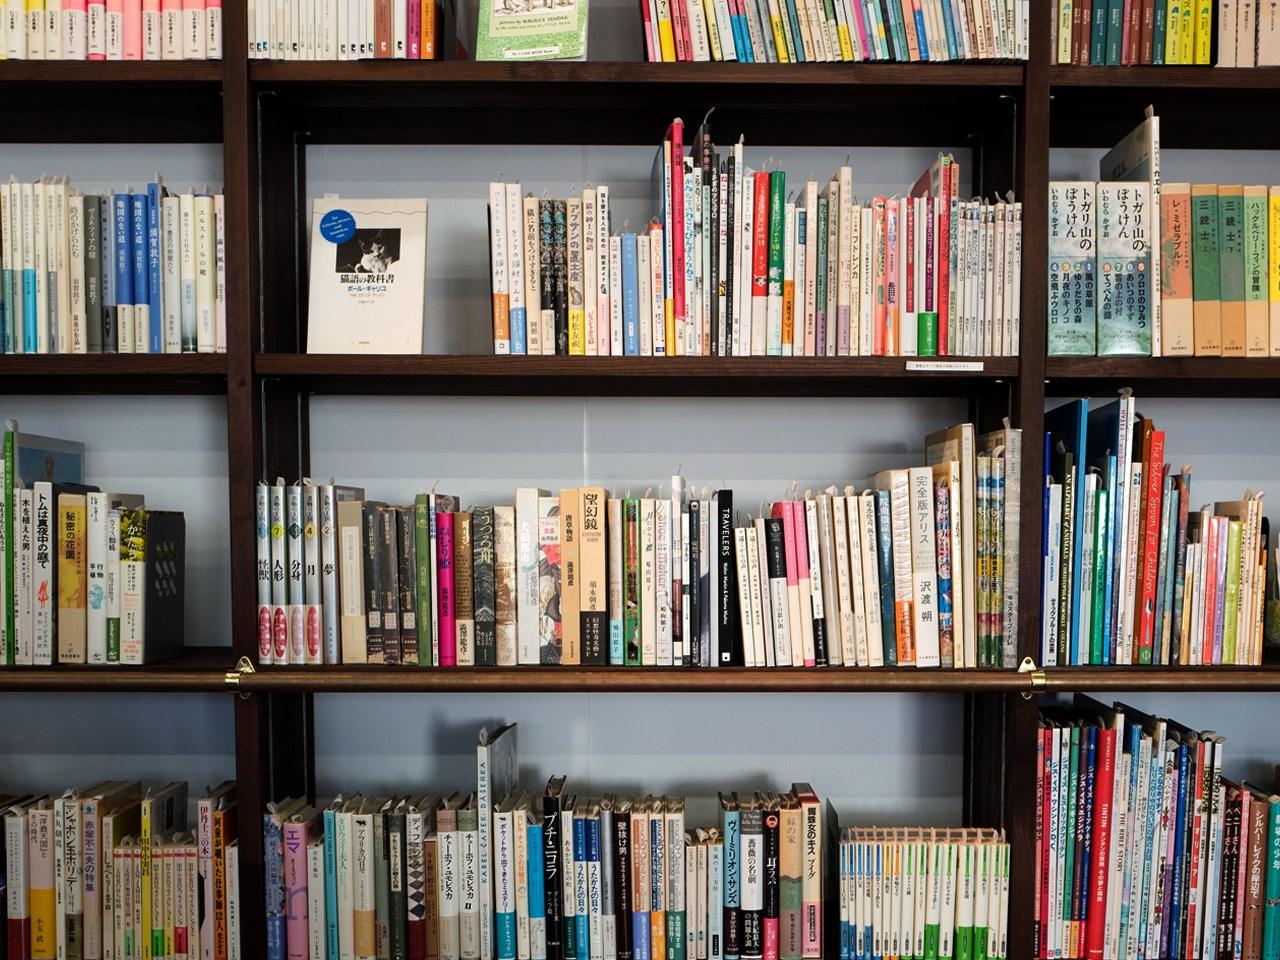 library books generic_1538673081148.jpg.jpg